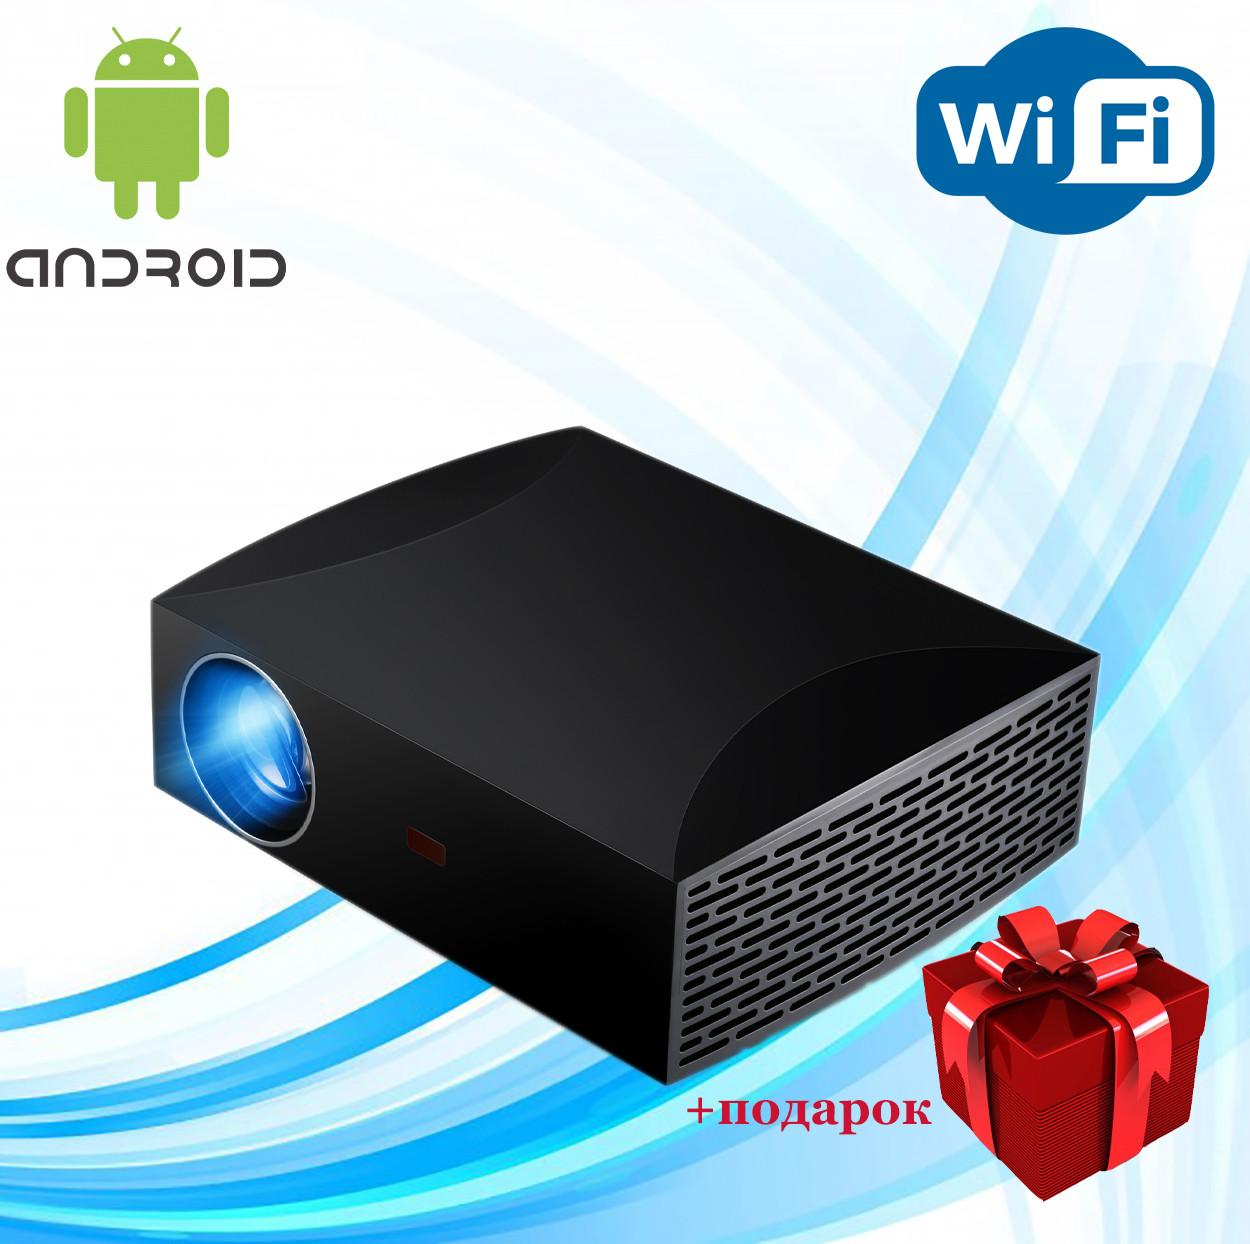 Проектор мультимедийный Full HD Wi-Fi Android стерео звук Vivibright Wi-light F30 домашний кинотеатр